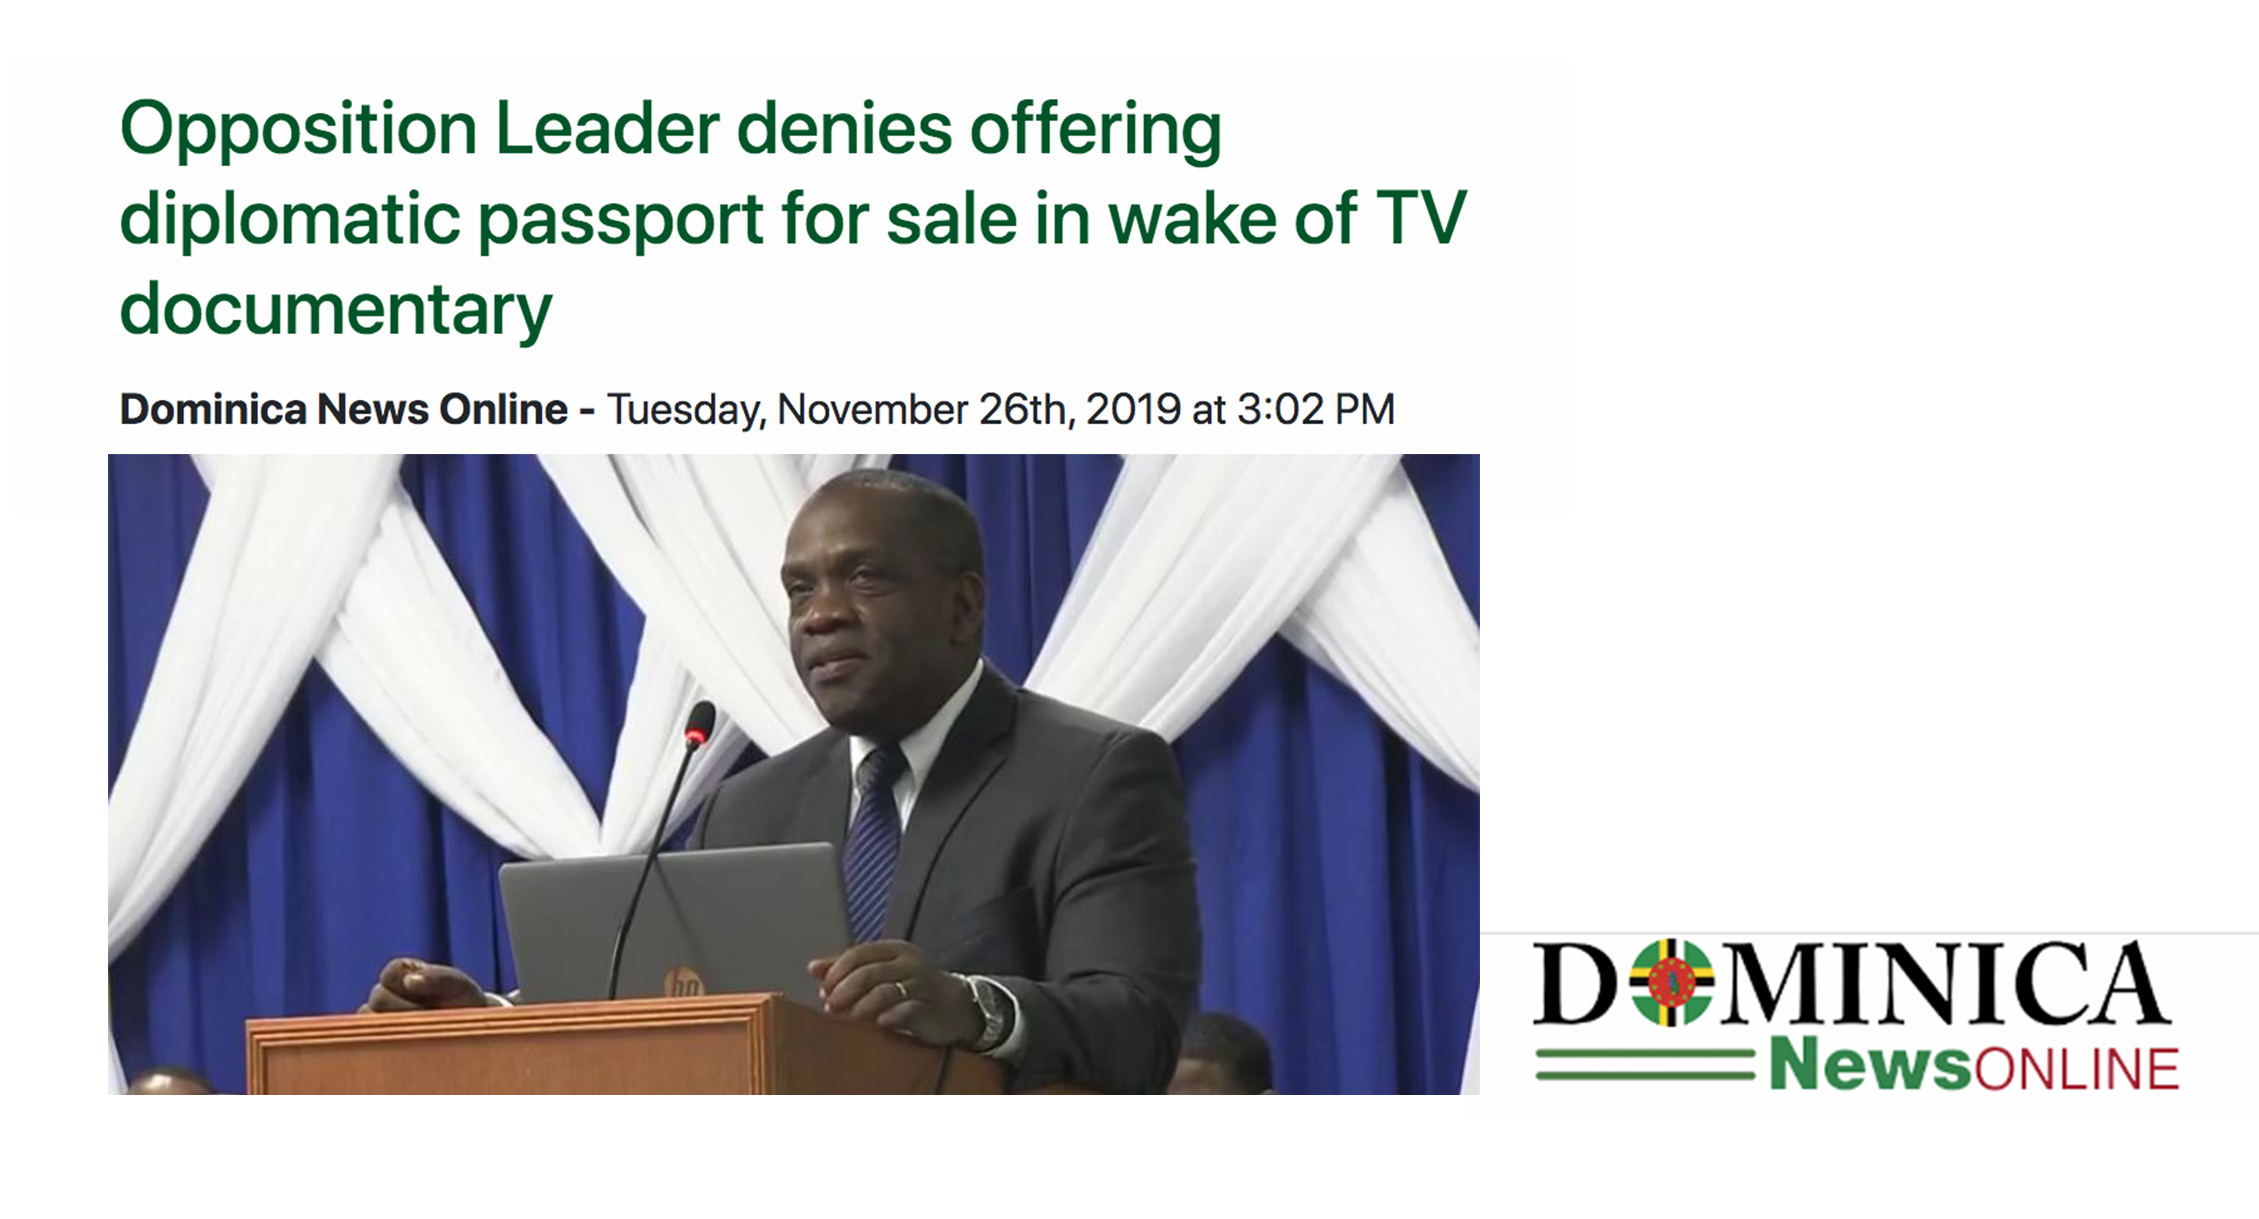 Dominica News Online: Opposition Leader denies offering diplomatic passport